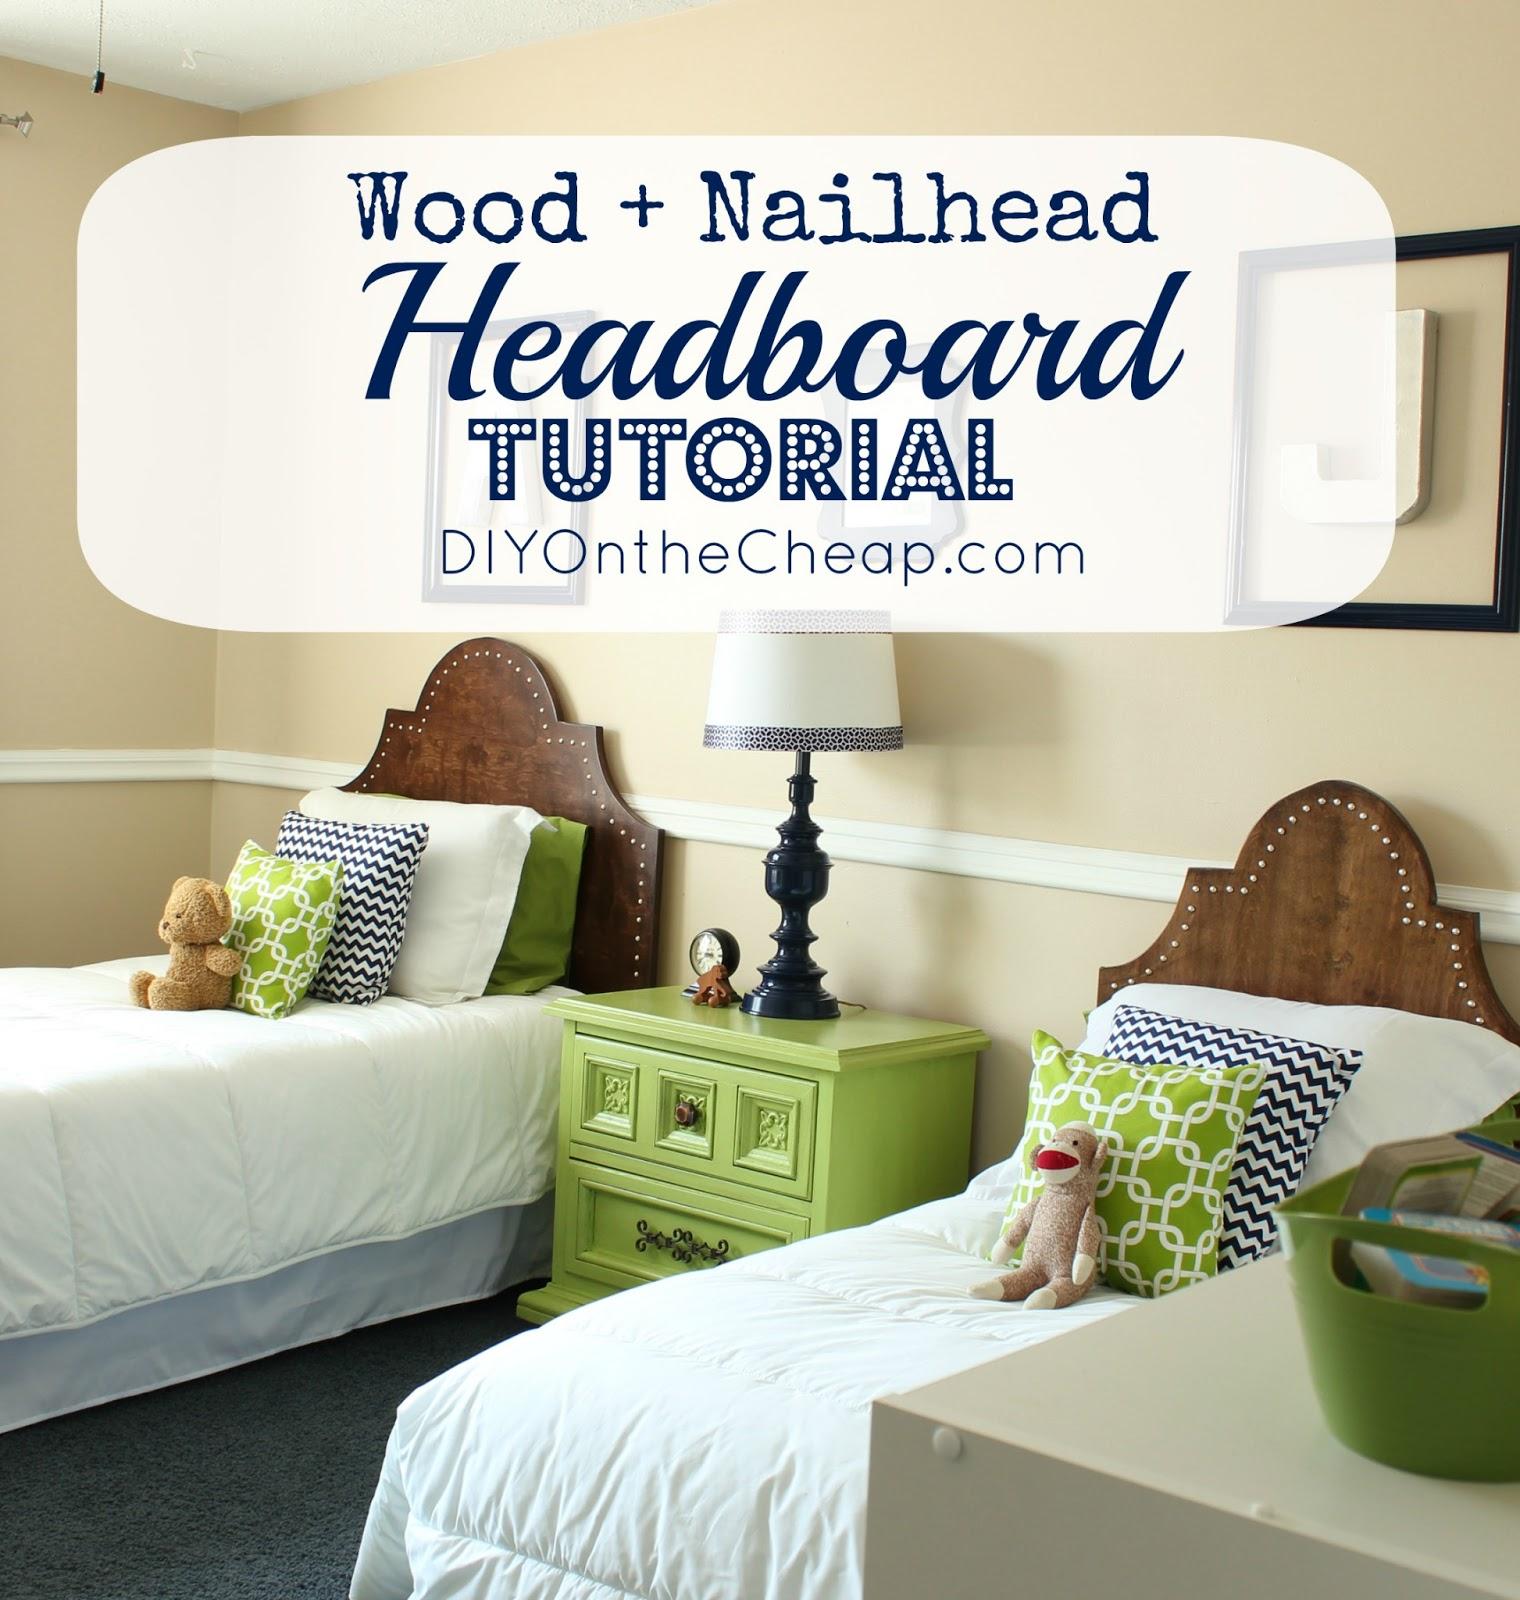 Cheap Wooden Headboards : DIY Wood + Nailhead Headboard Tutorial - DIY on the Cheap by Erin ...